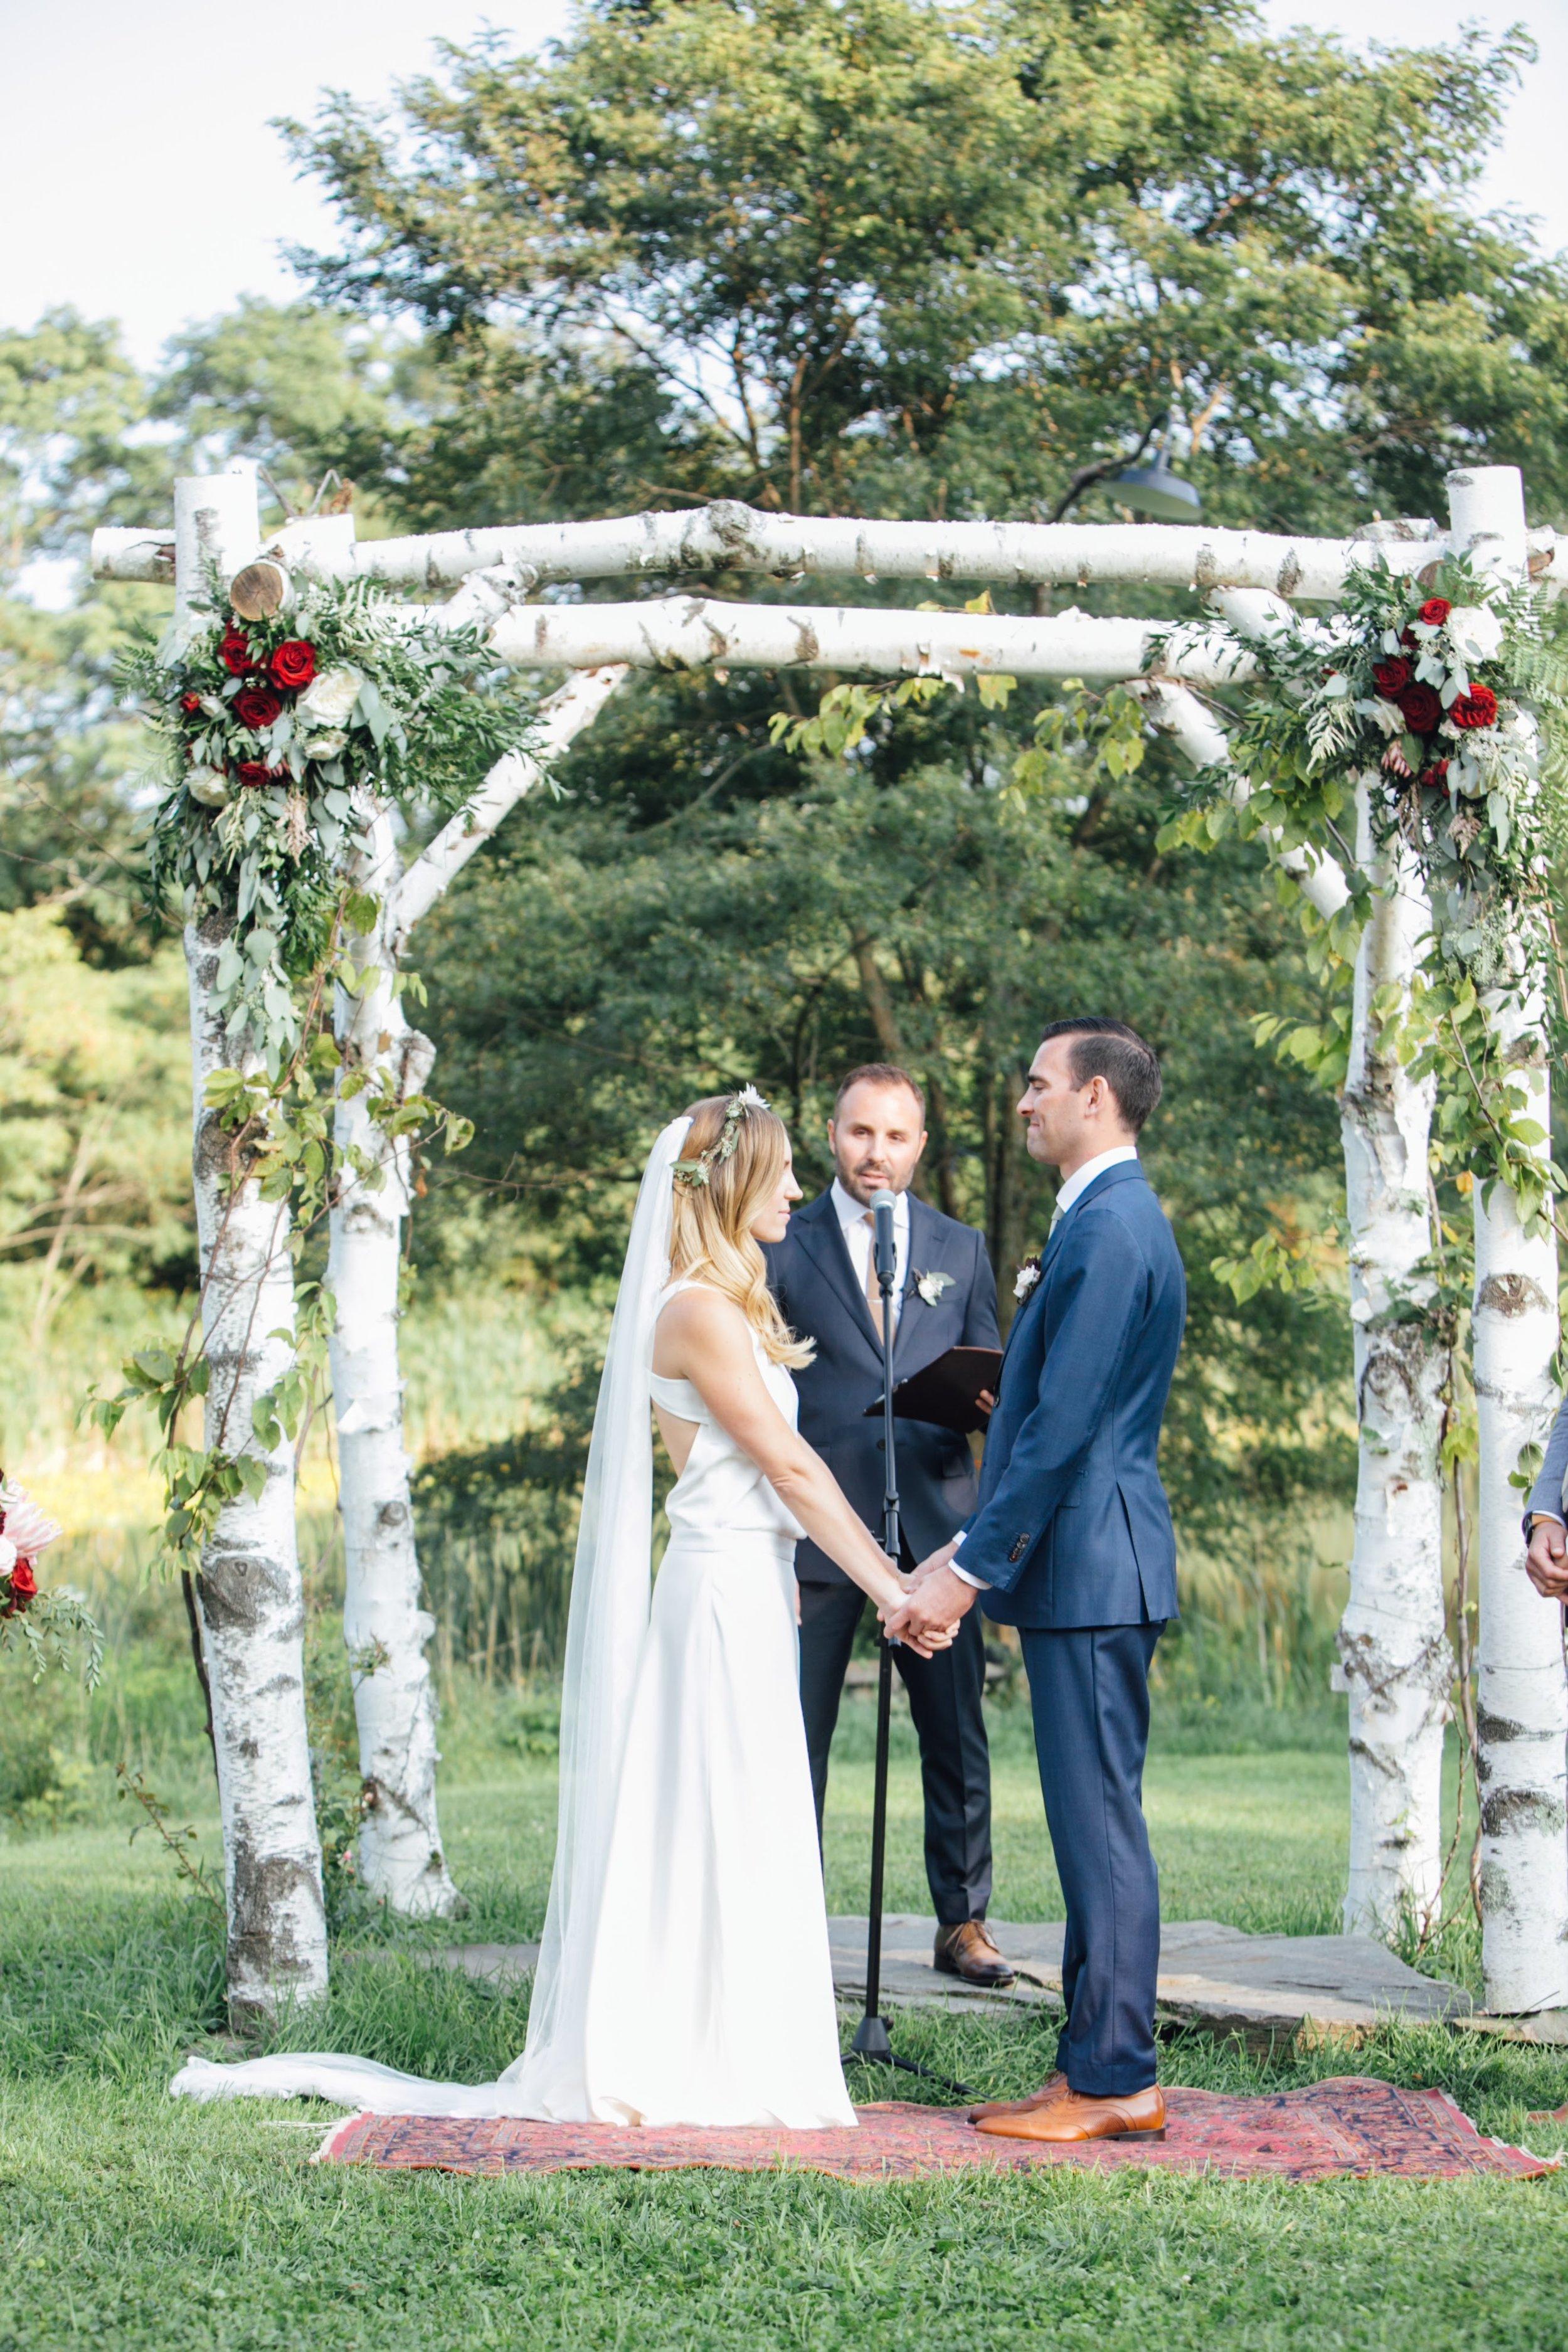 Courtney + Matt Blenheim Hill Farm Catskills NY Wedding Veronica Lola Photography 2017-409.jpg